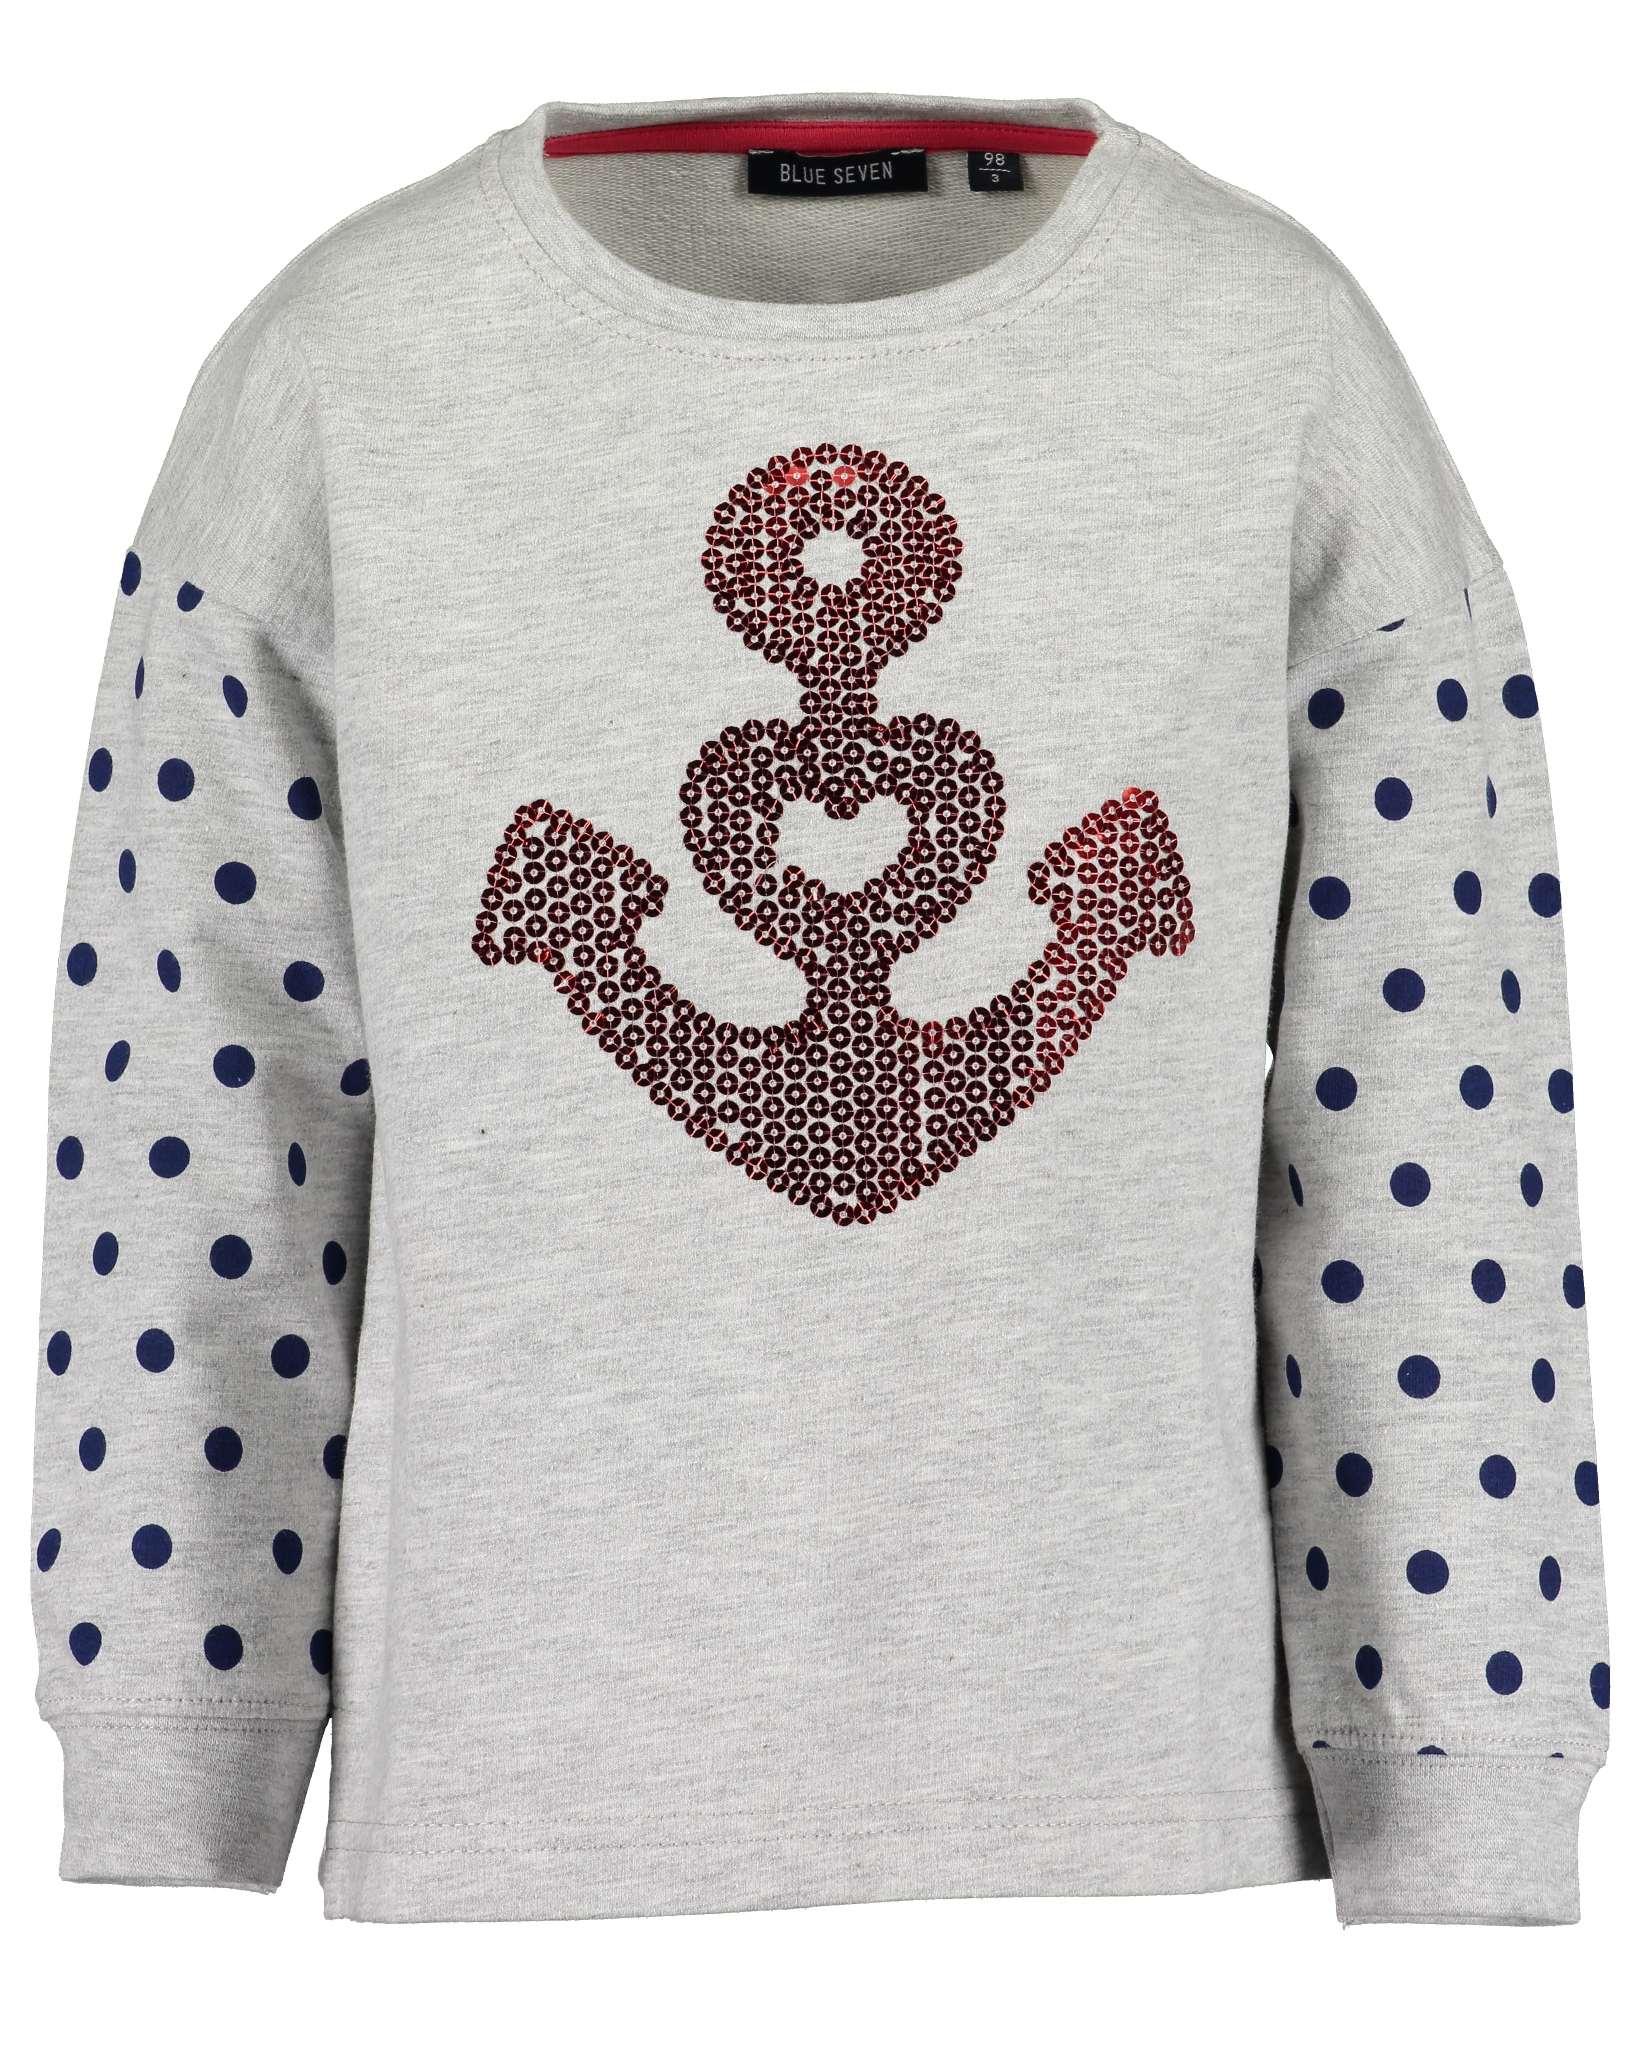 Sweatshirt 122 nebel Blue Seven